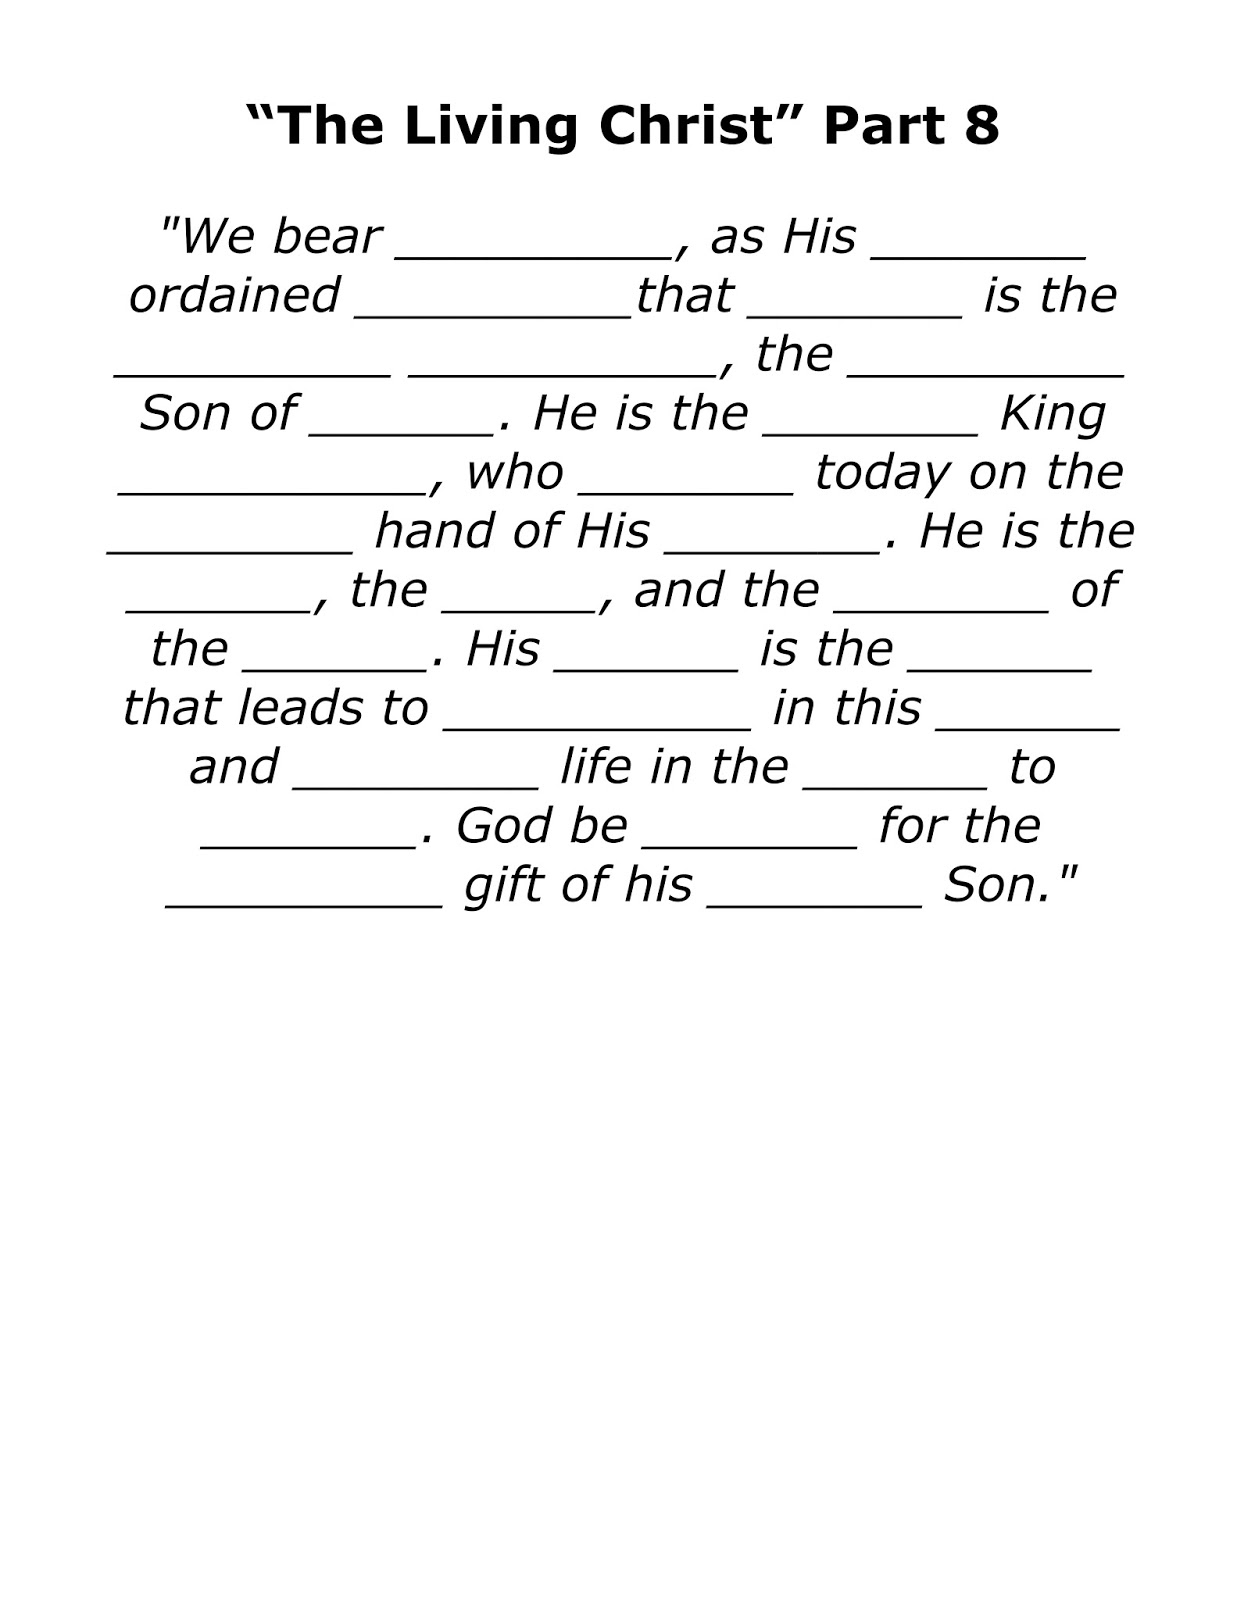 The Living Christ Songs The Living Christ Part 8